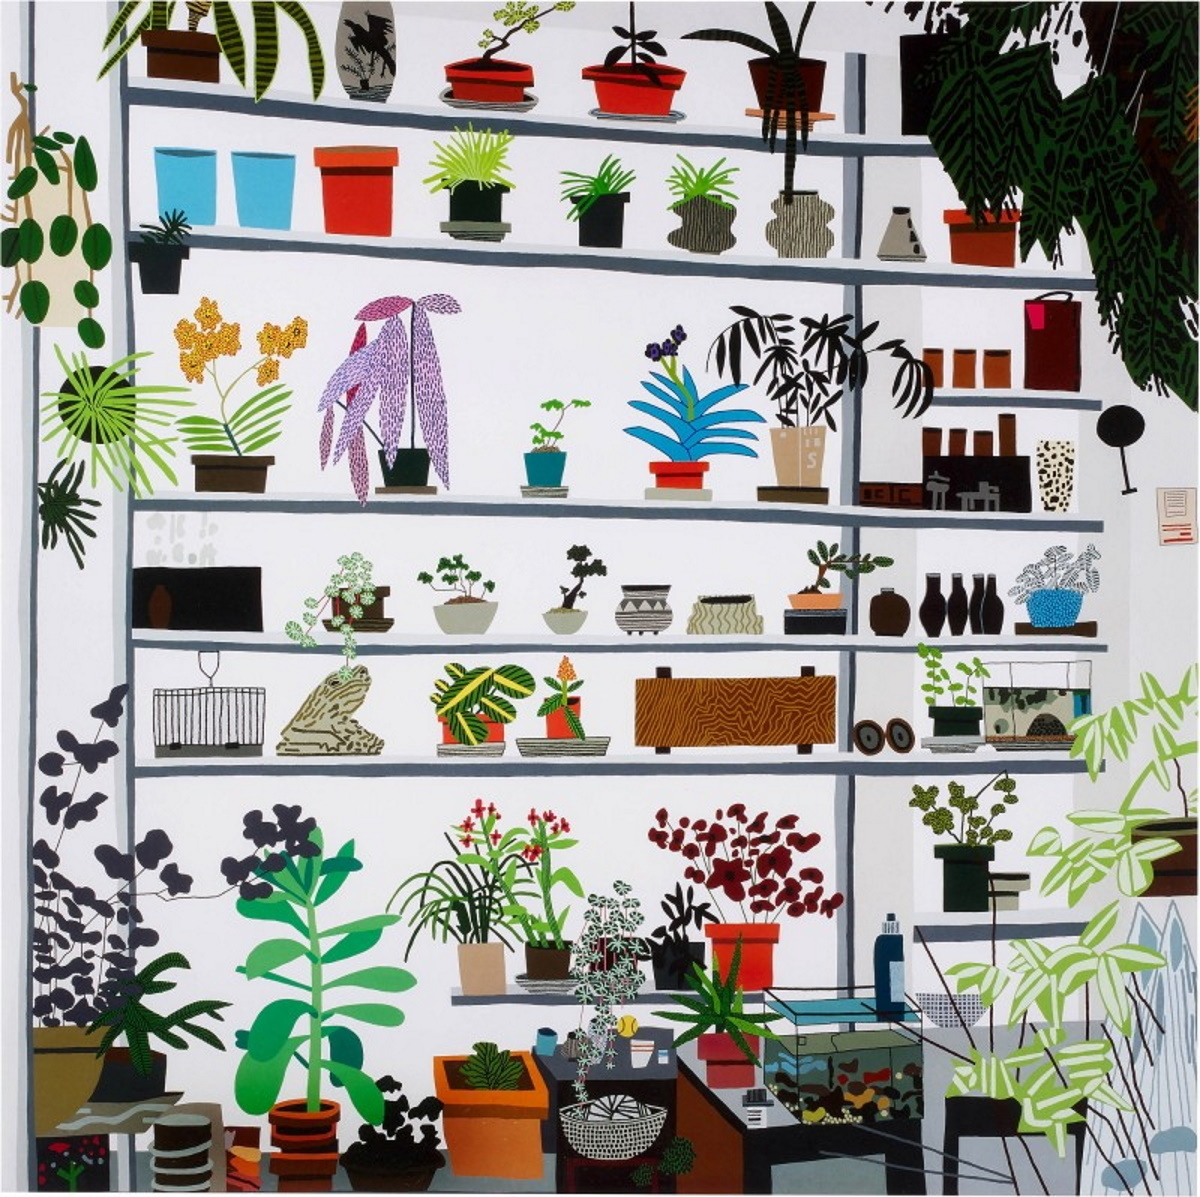 Jonas Wood, Large Shelf Still Life, 2017. Courtesy of Browse & Darby.